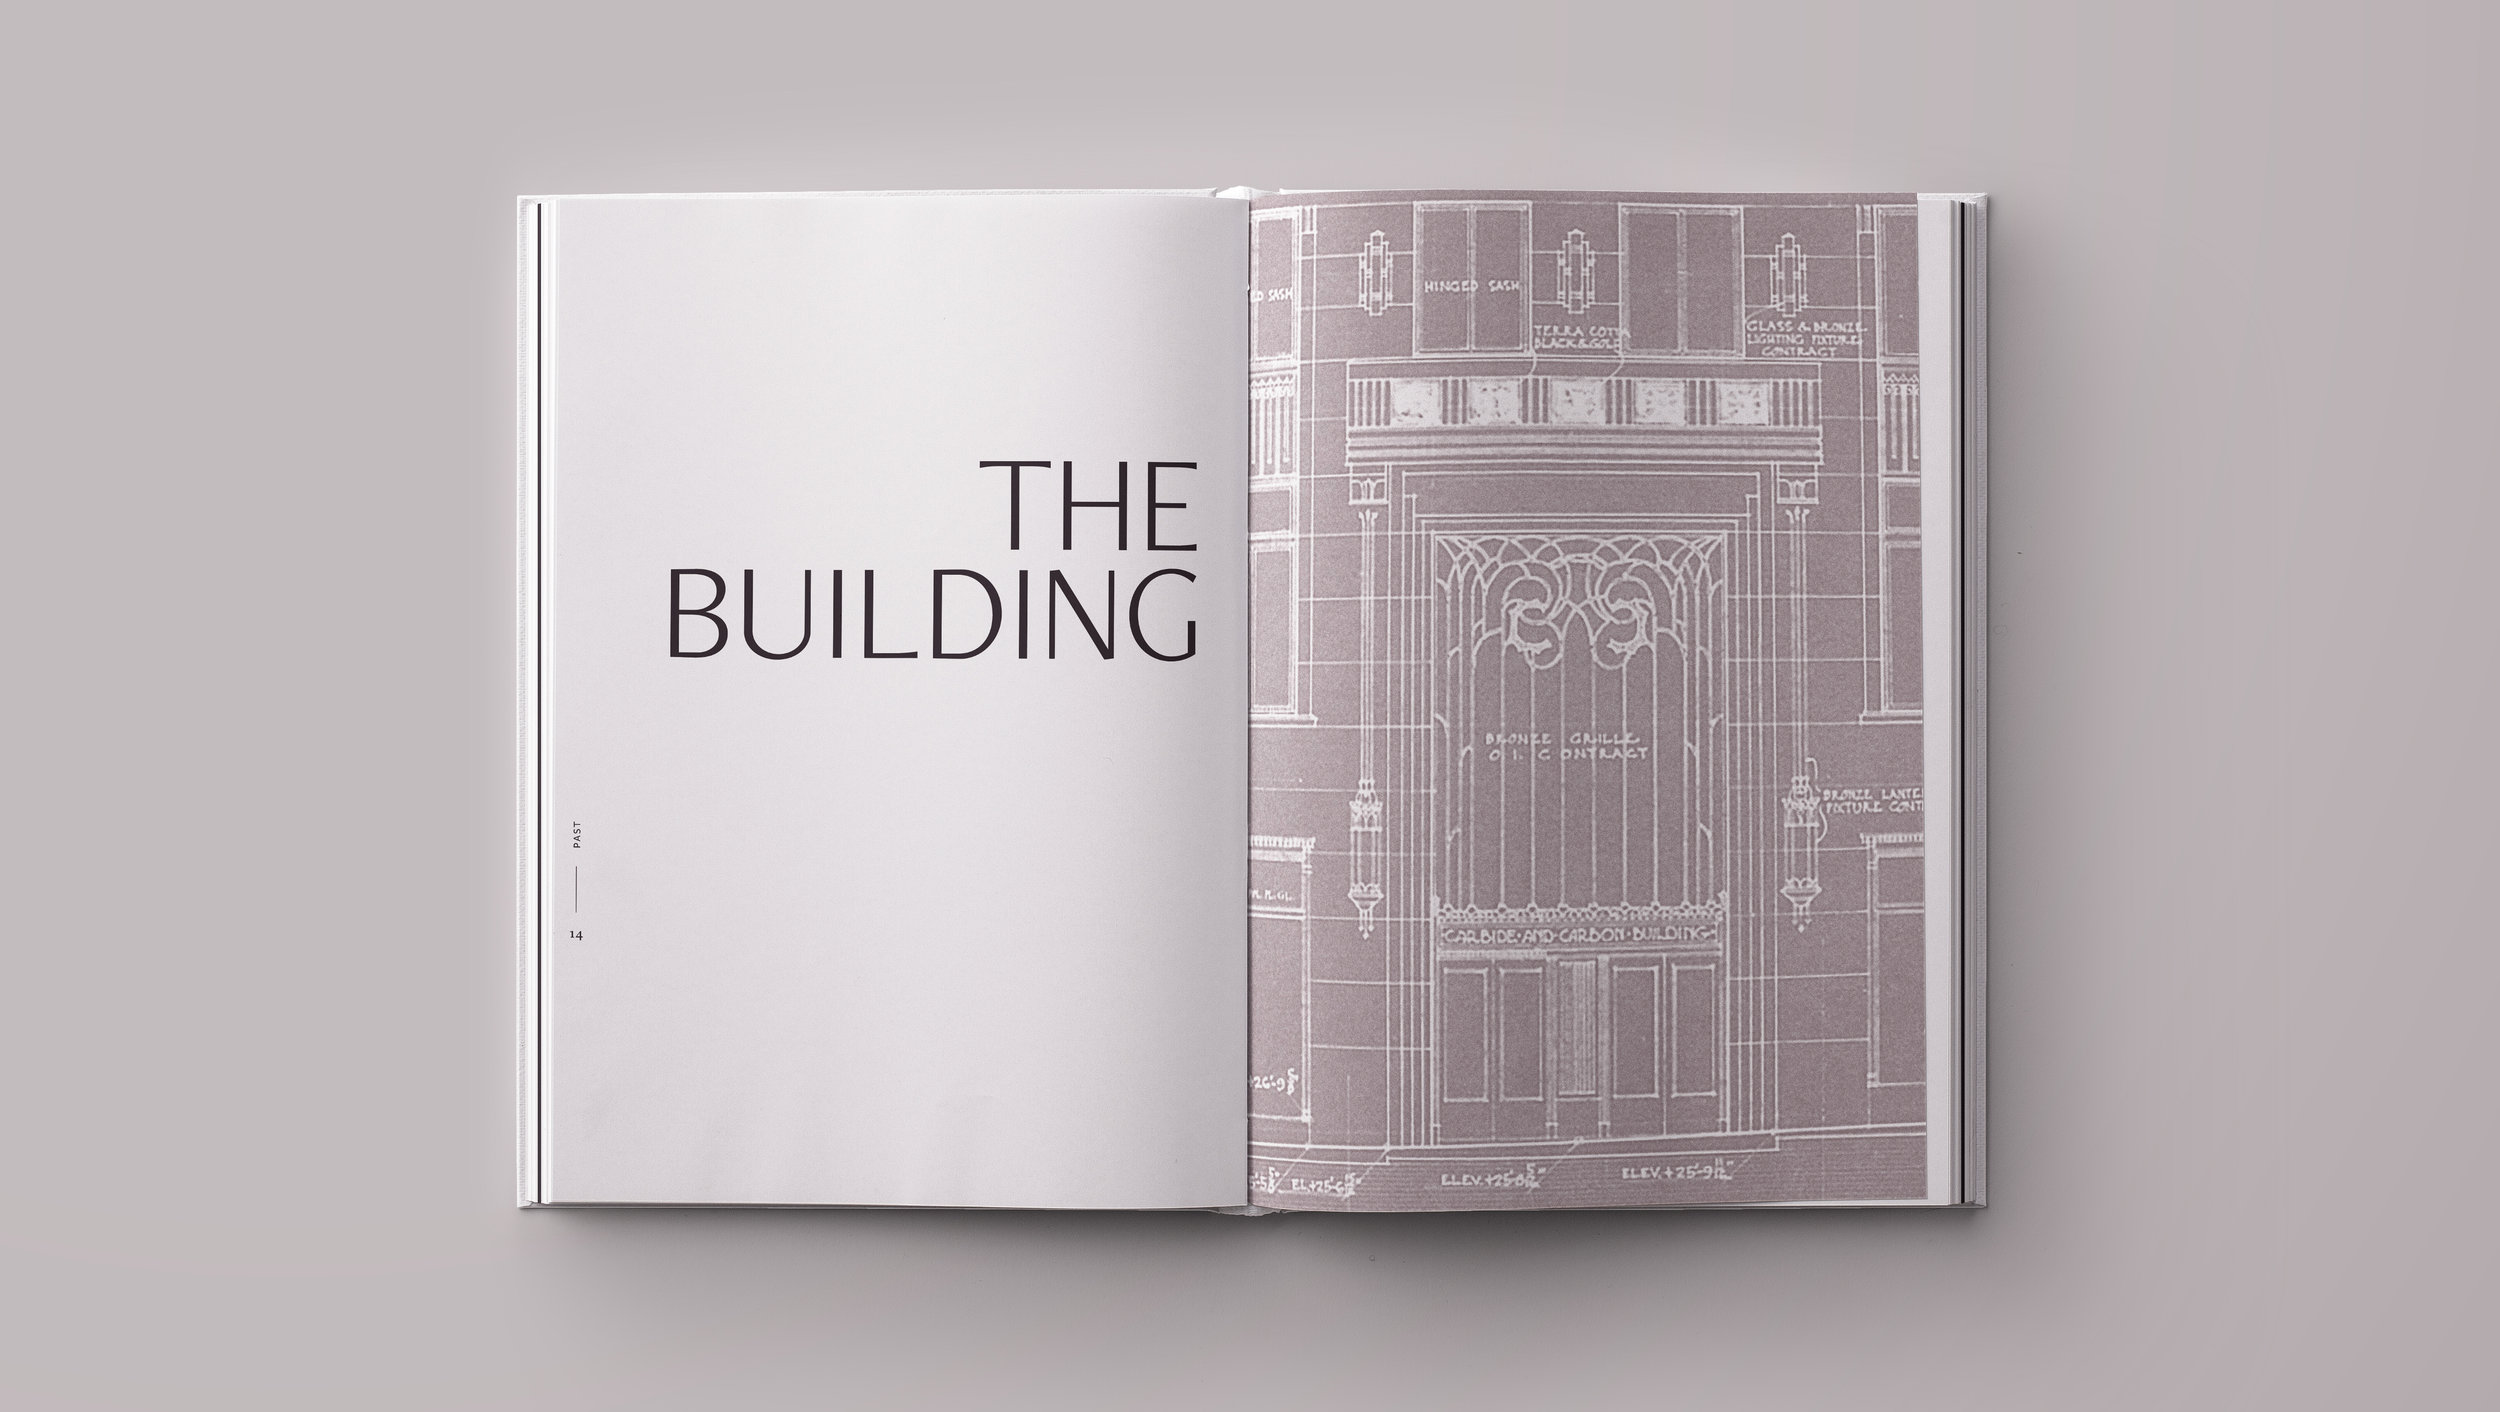 StJane_Book_0001_The Building 1.jpg